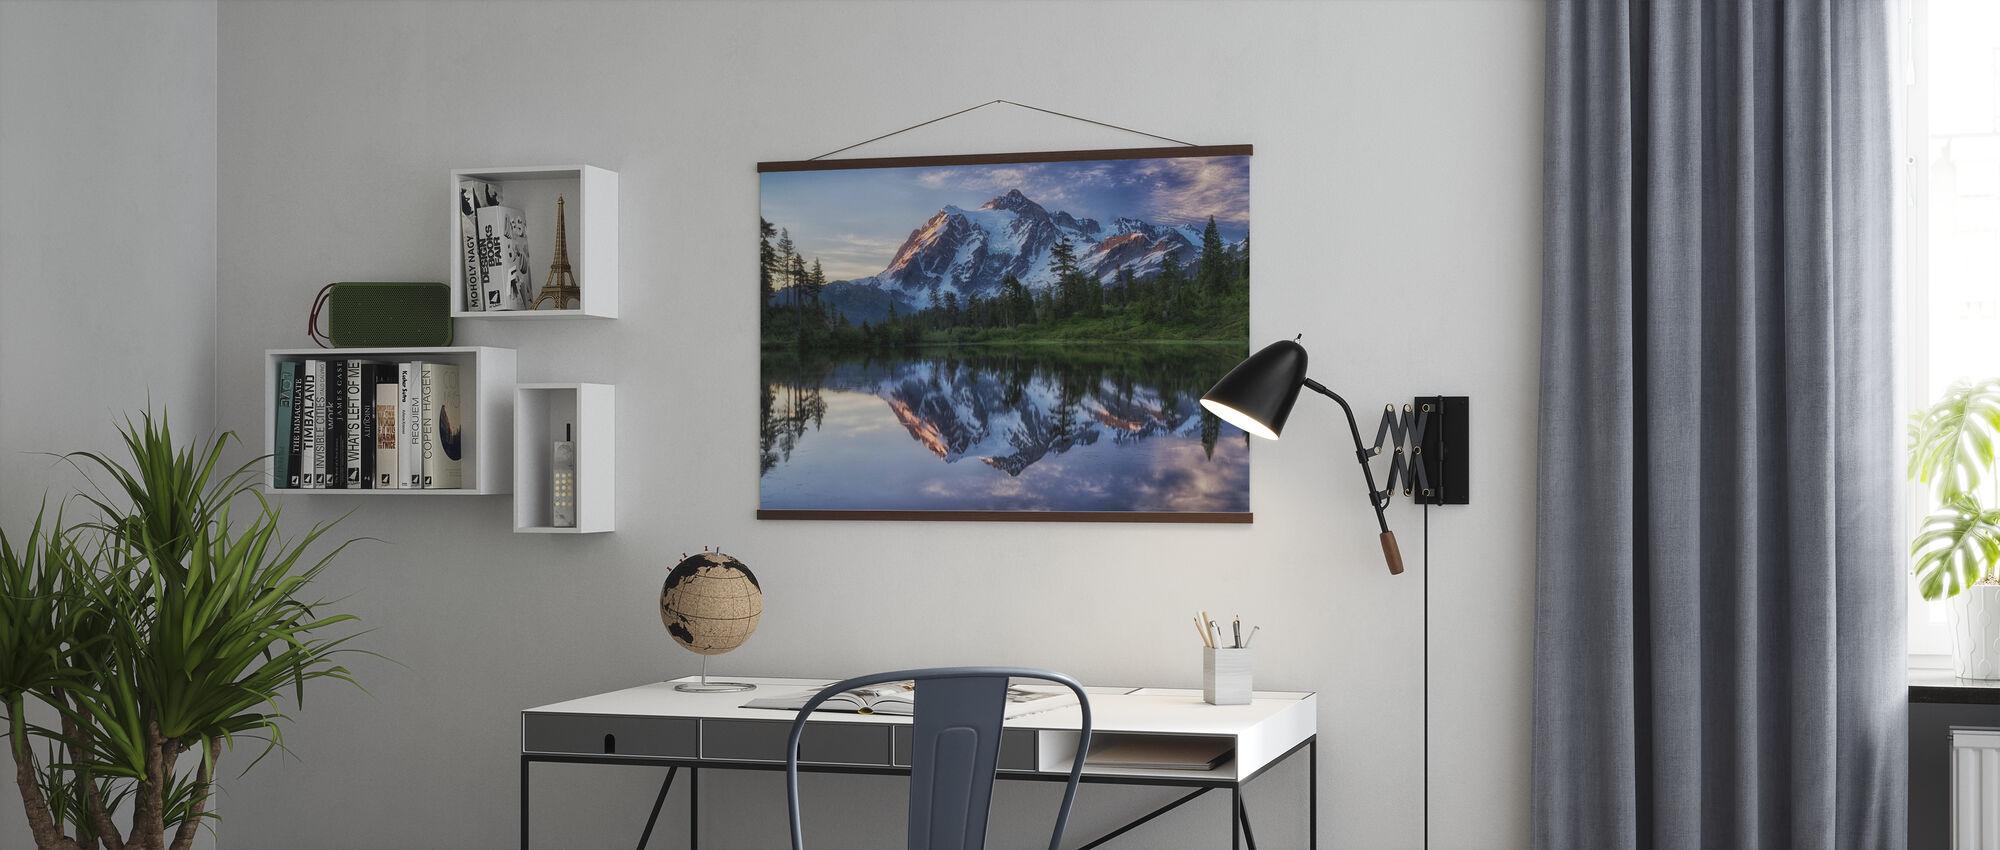 Sonnenaufgang auf dem Berg Shuksan, Washington, USA - Poster - Büro